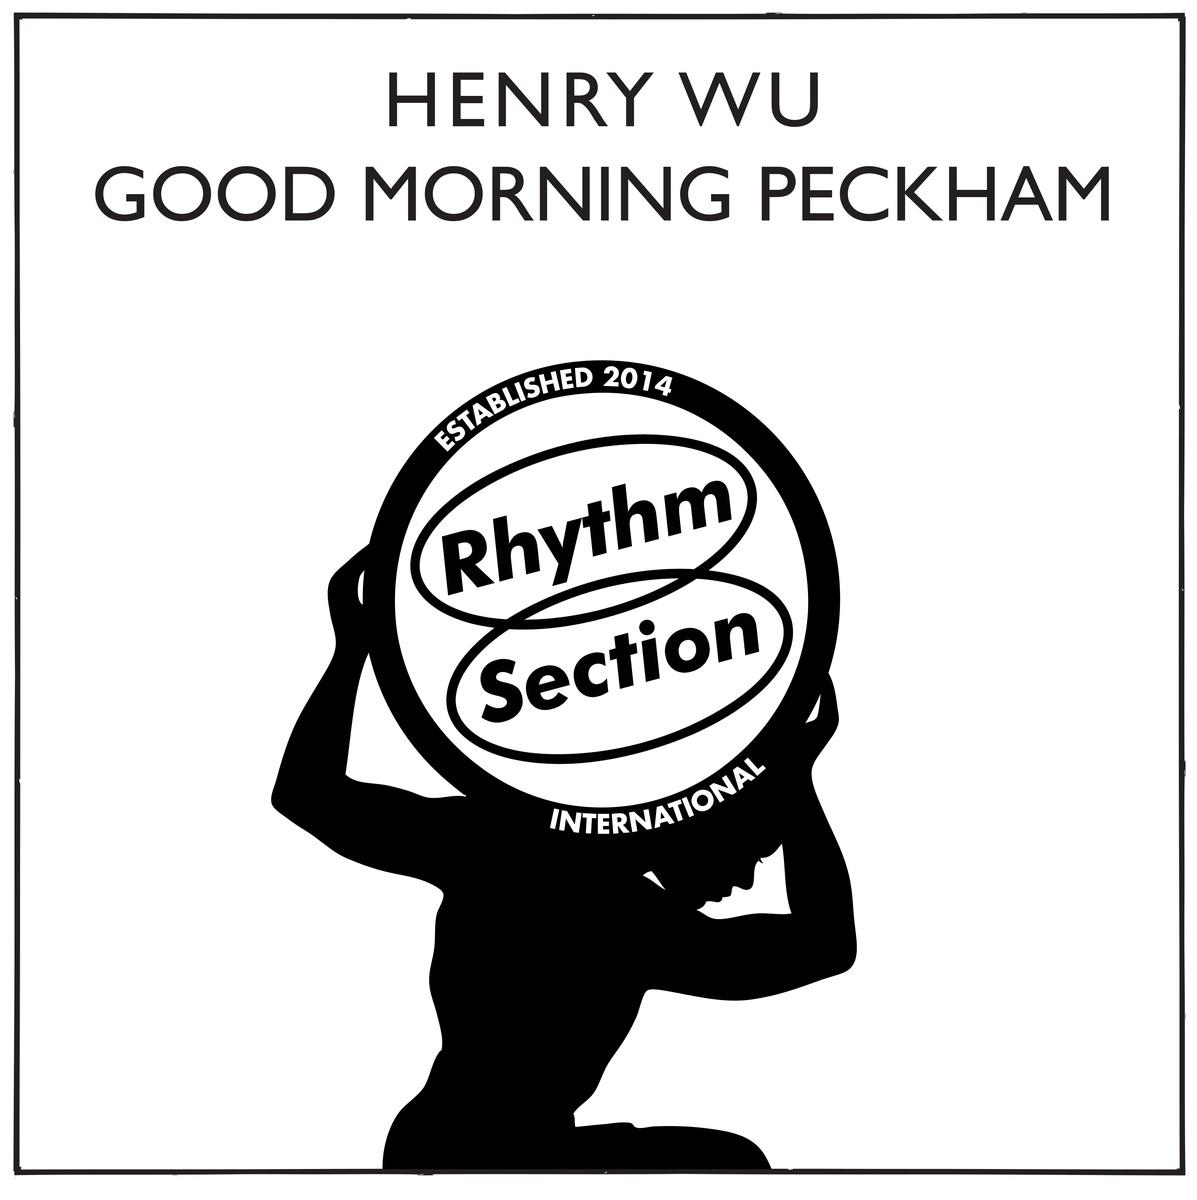 CREDIT: Rhythm Section International / Henry Wu